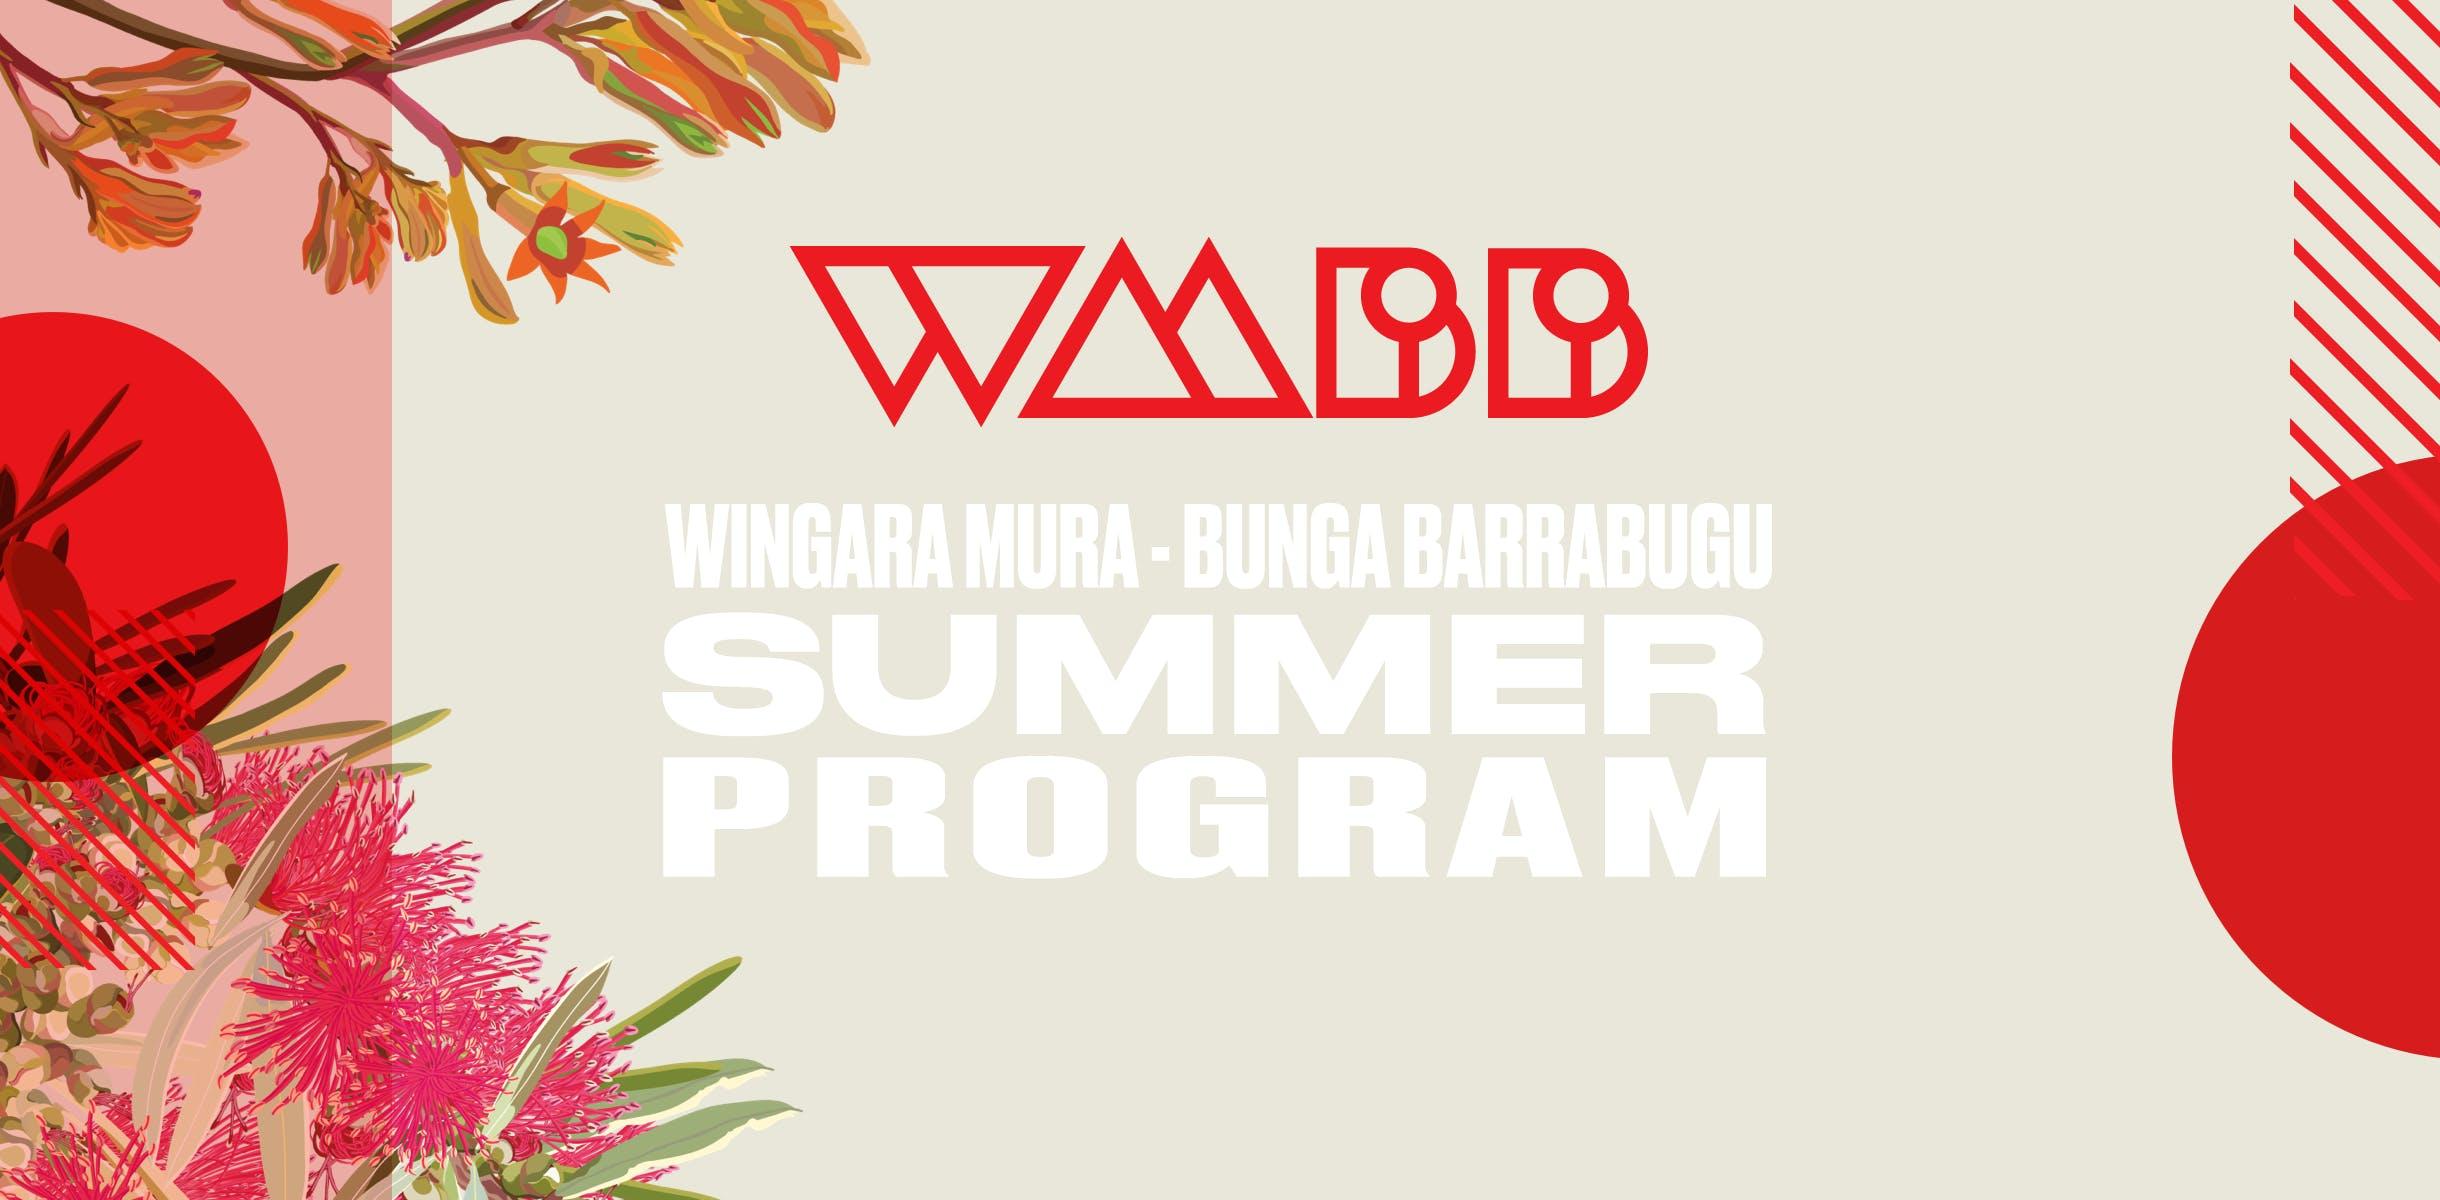 WINGARA MURA – BUNGA BARRABUGU SUMMER PROGRAM